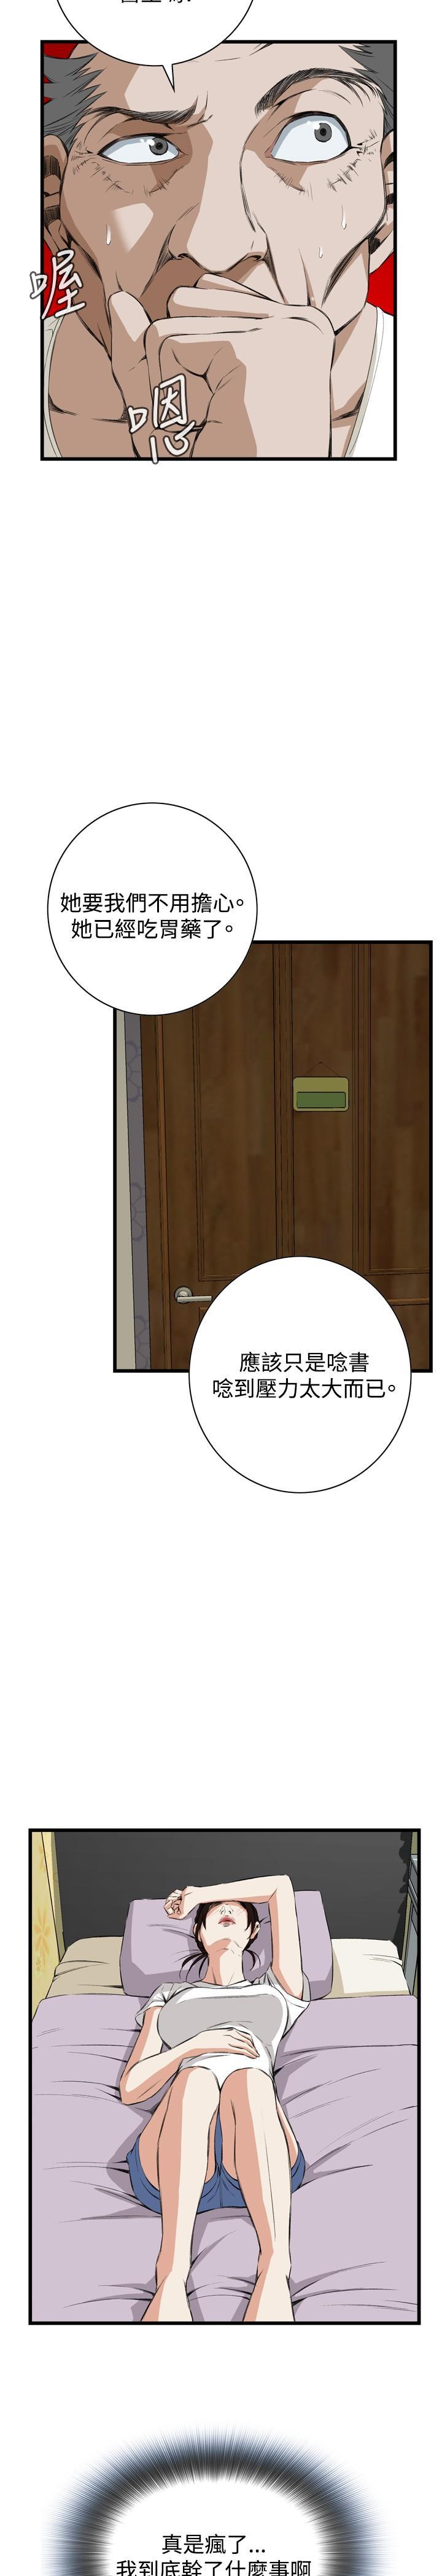 Take a Peek 偷窥 Ch.39~55 [Chinese]中文 416